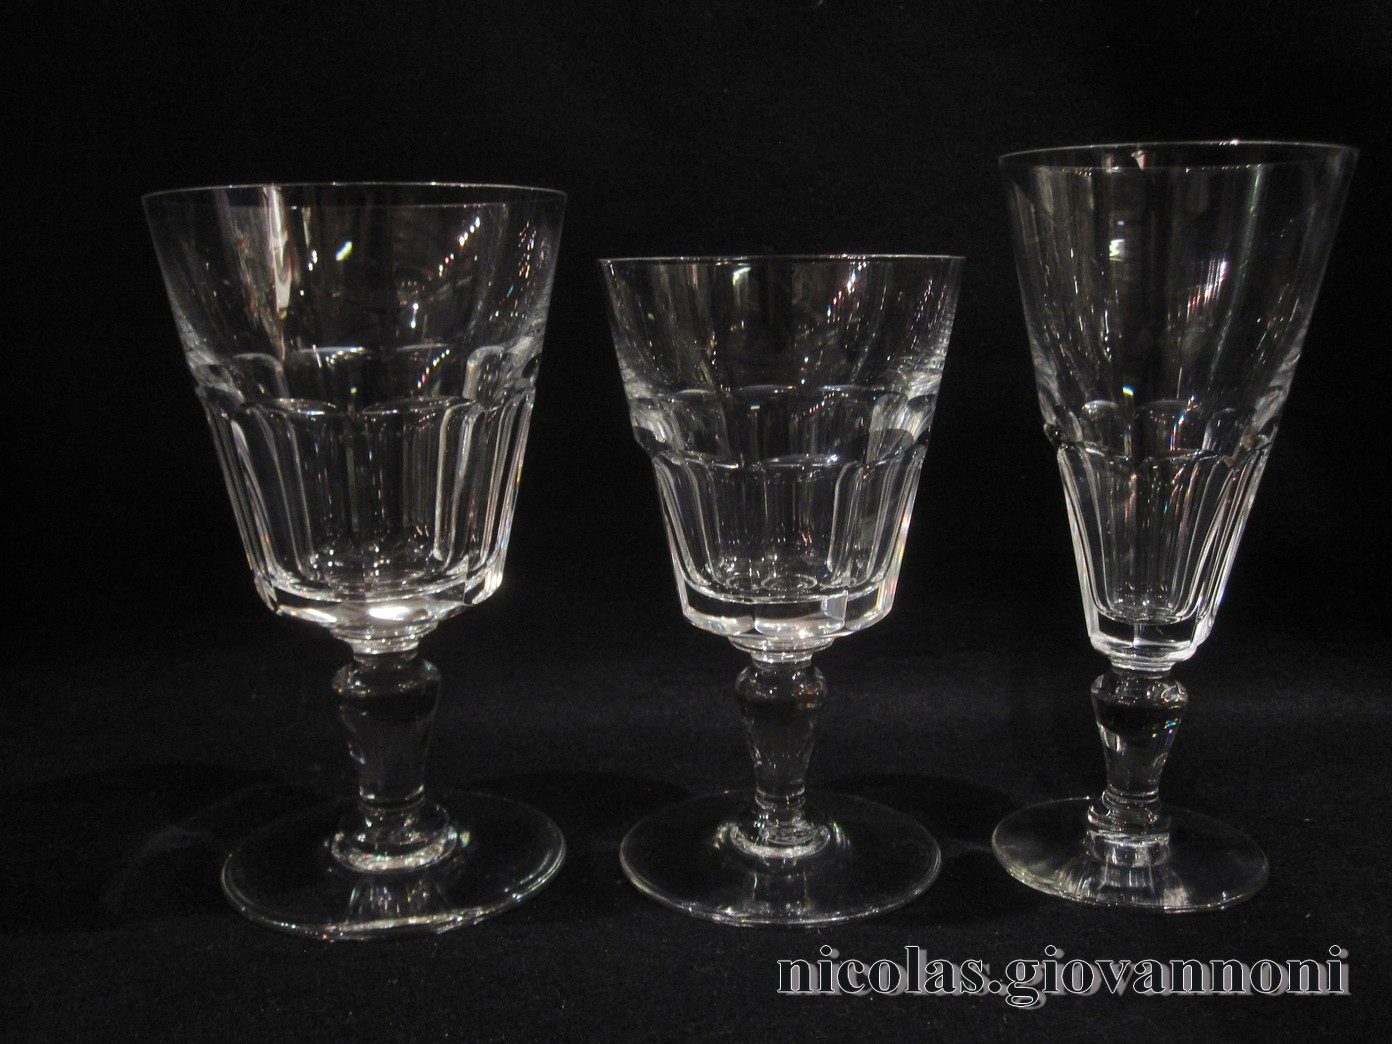 29 verres missouri baccarat cristal catalogue cristal de france nicolas giovannoni. Black Bedroom Furniture Sets. Home Design Ideas